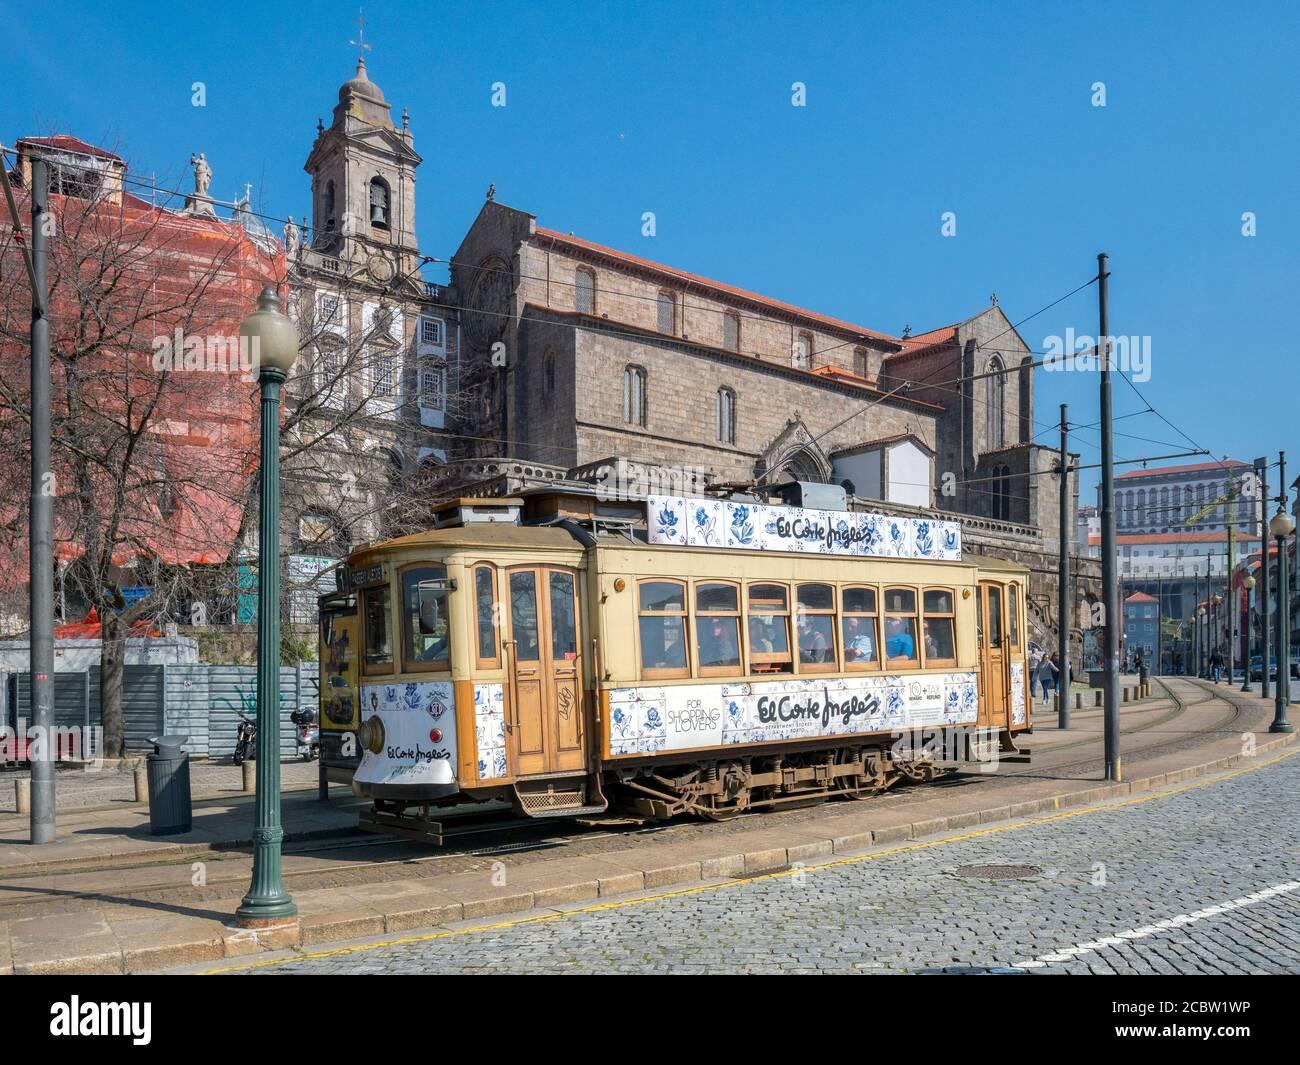 10. März 2020: Porto, Portugal - Vintage-Straßenbahn an der Endstation Infante, vor der Kirche des heiligen Franziskus in Porto. Stockfoto